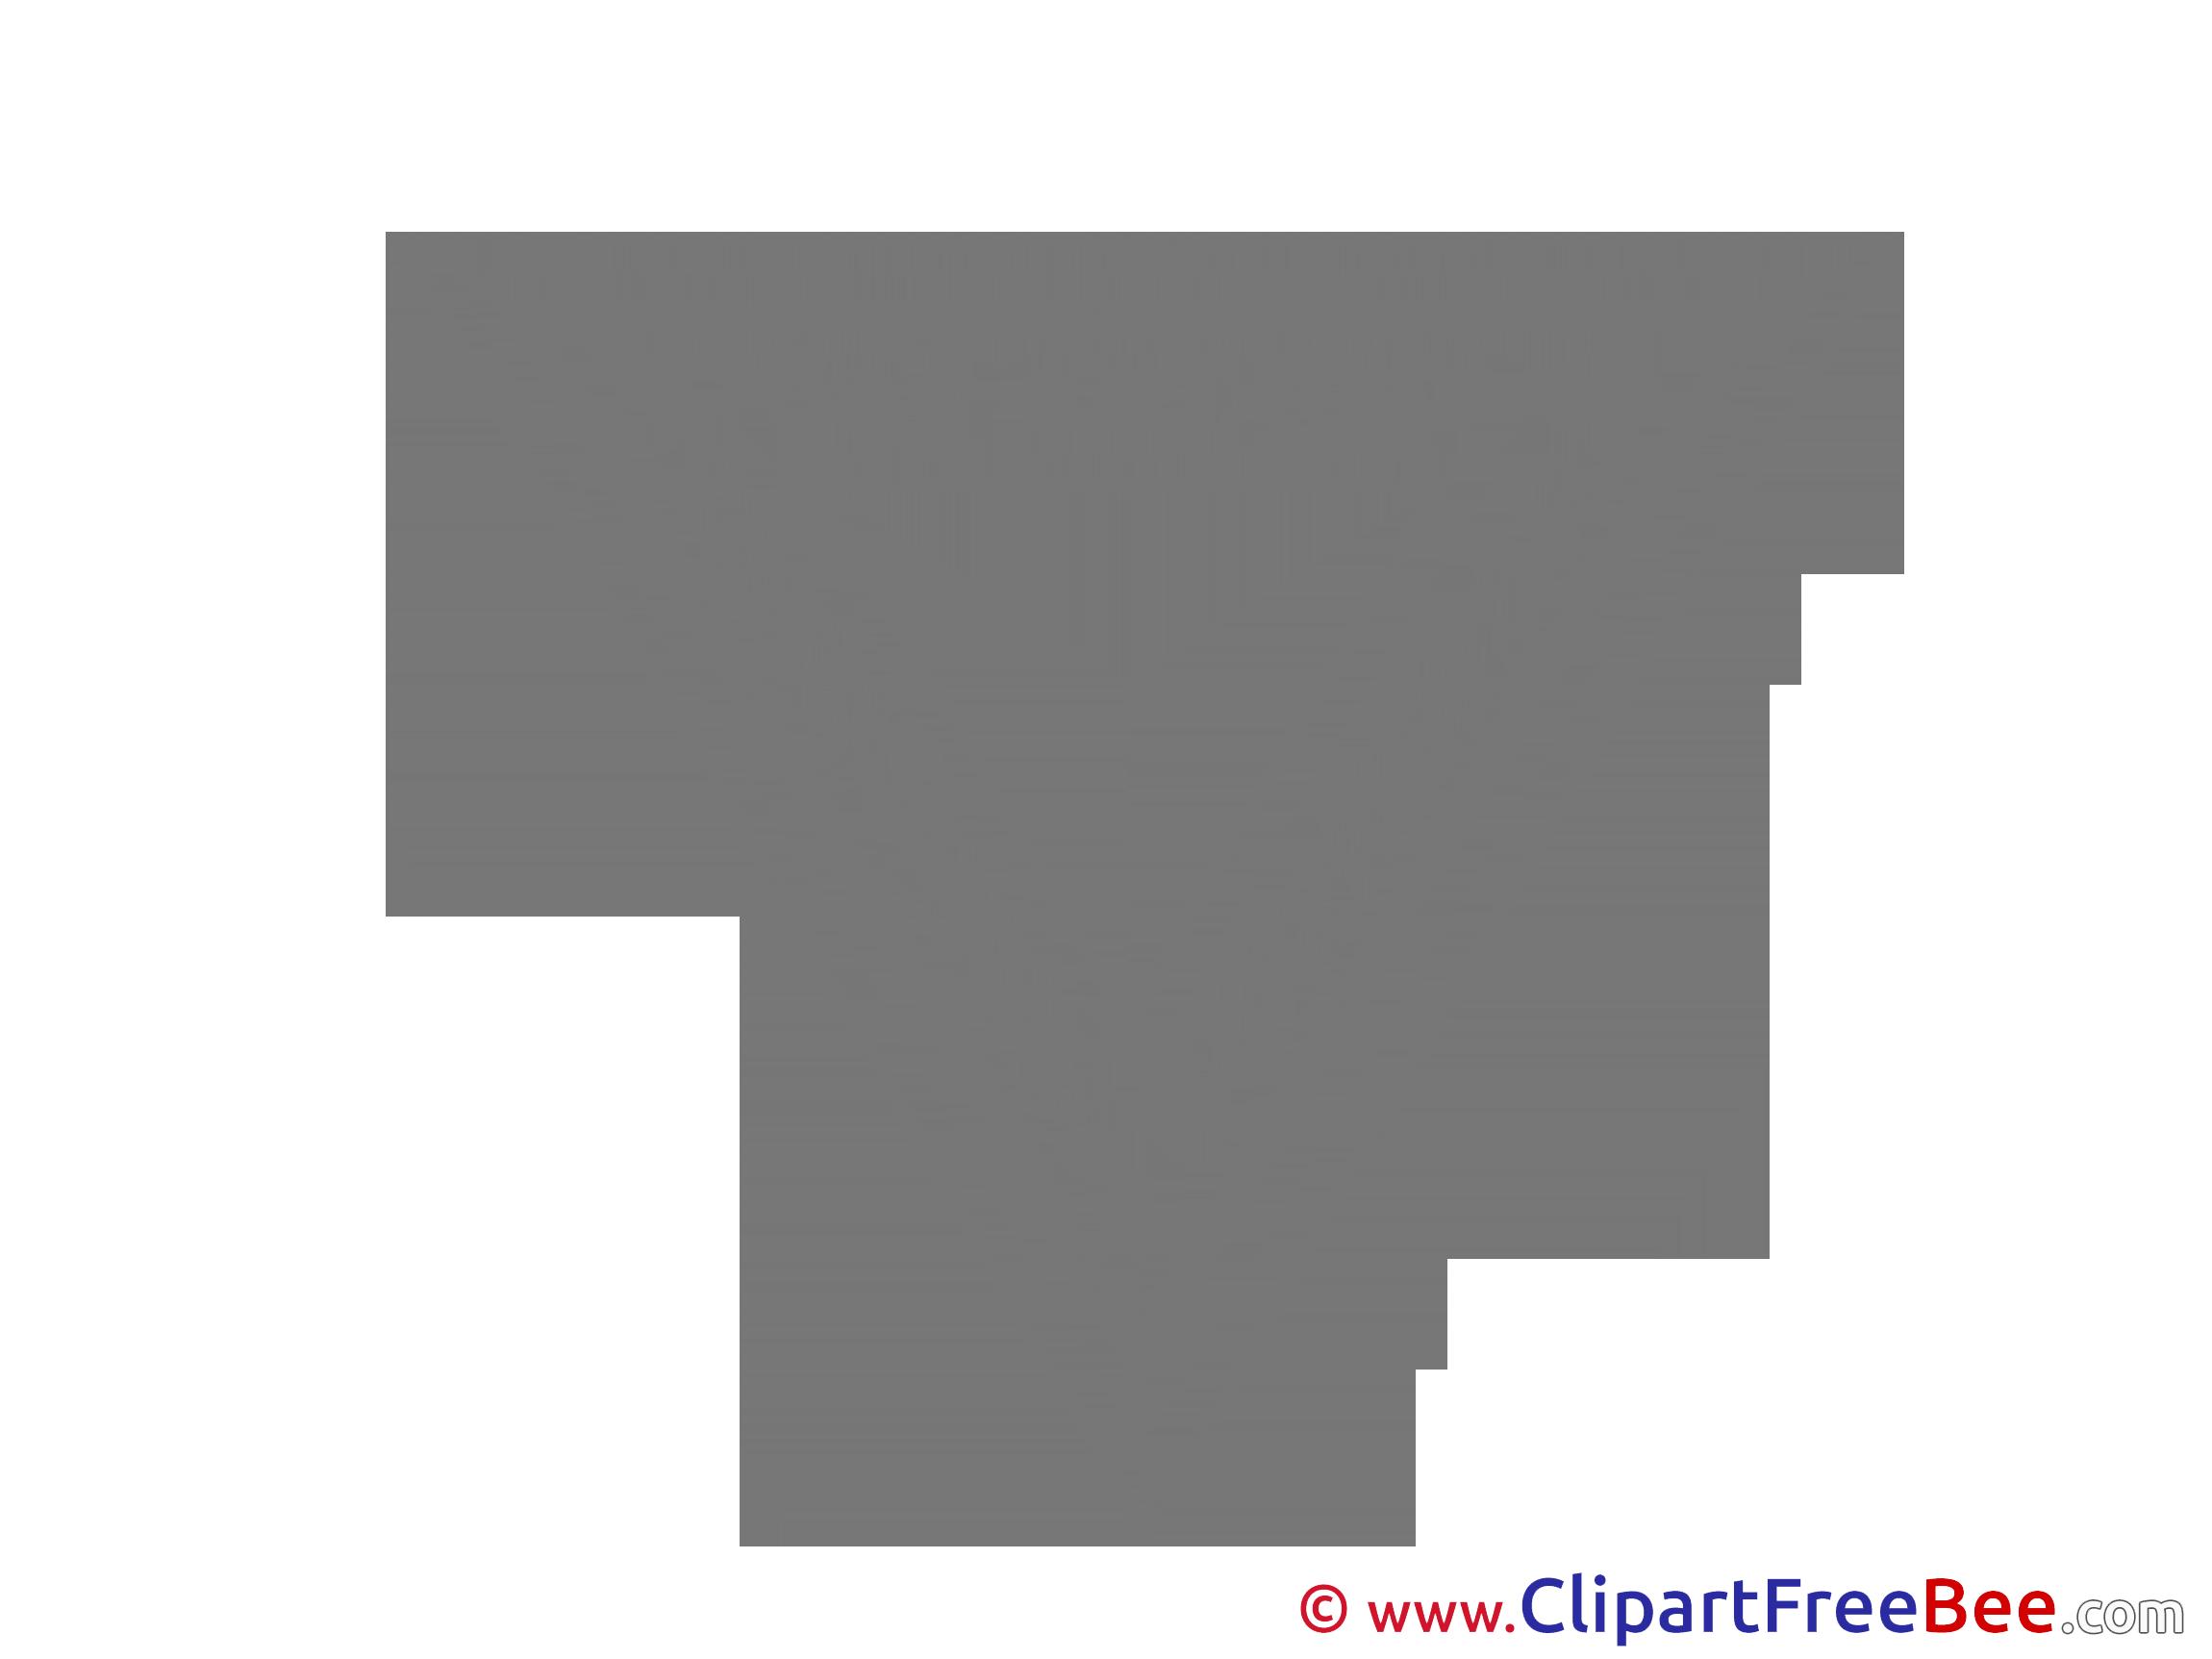 Top illustrations for free. Stamp clipart secret